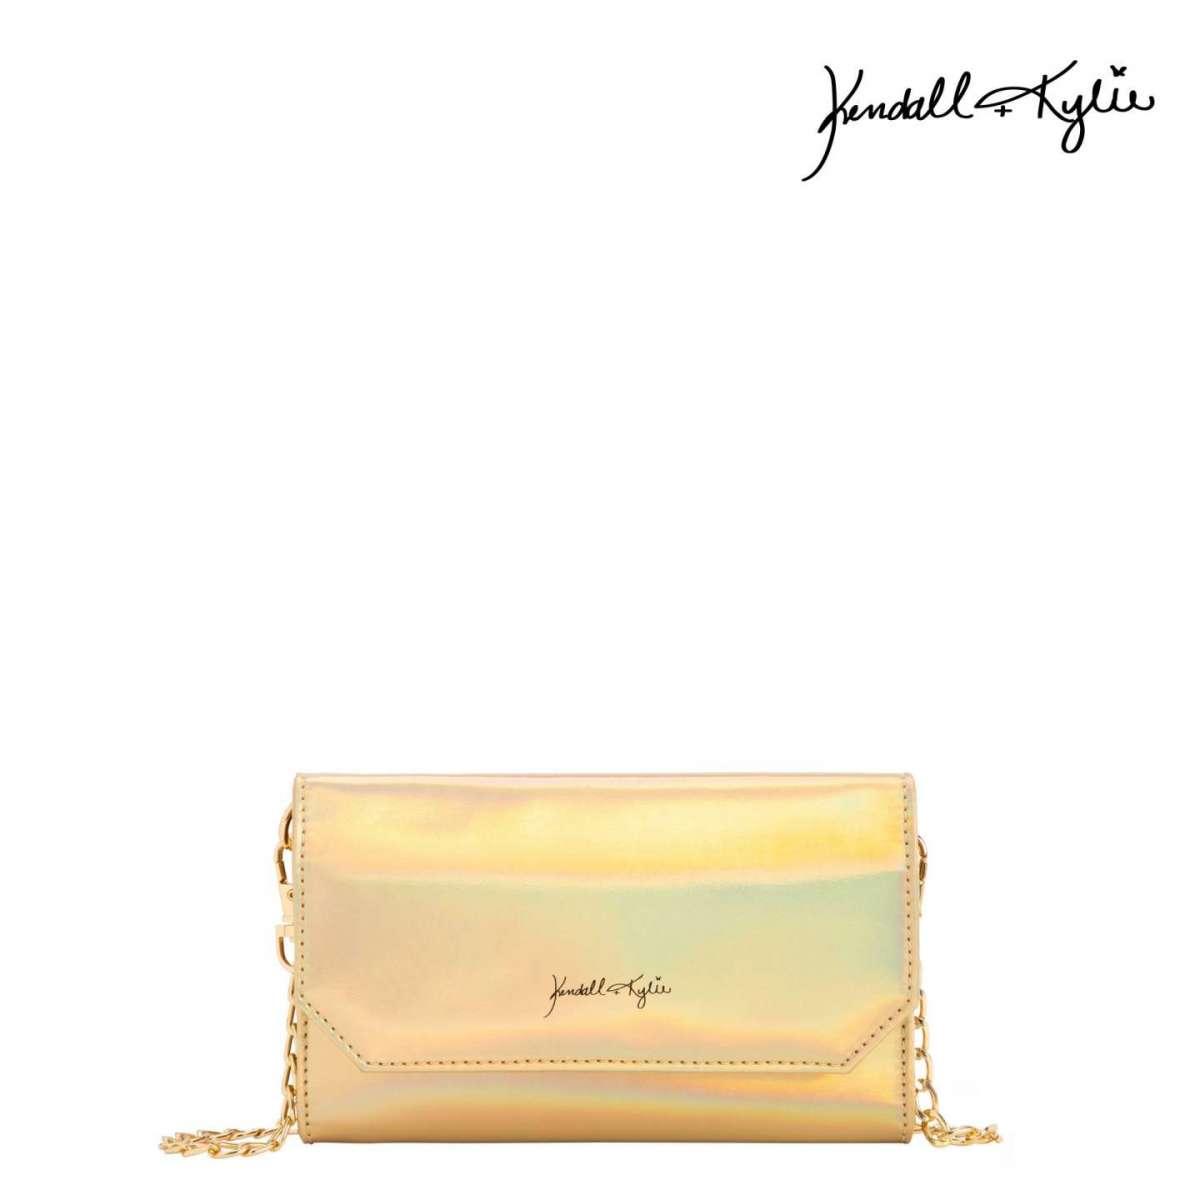 Borsa a tracolla oro Kendall + Kylie for Carpisa a 29,95 euro